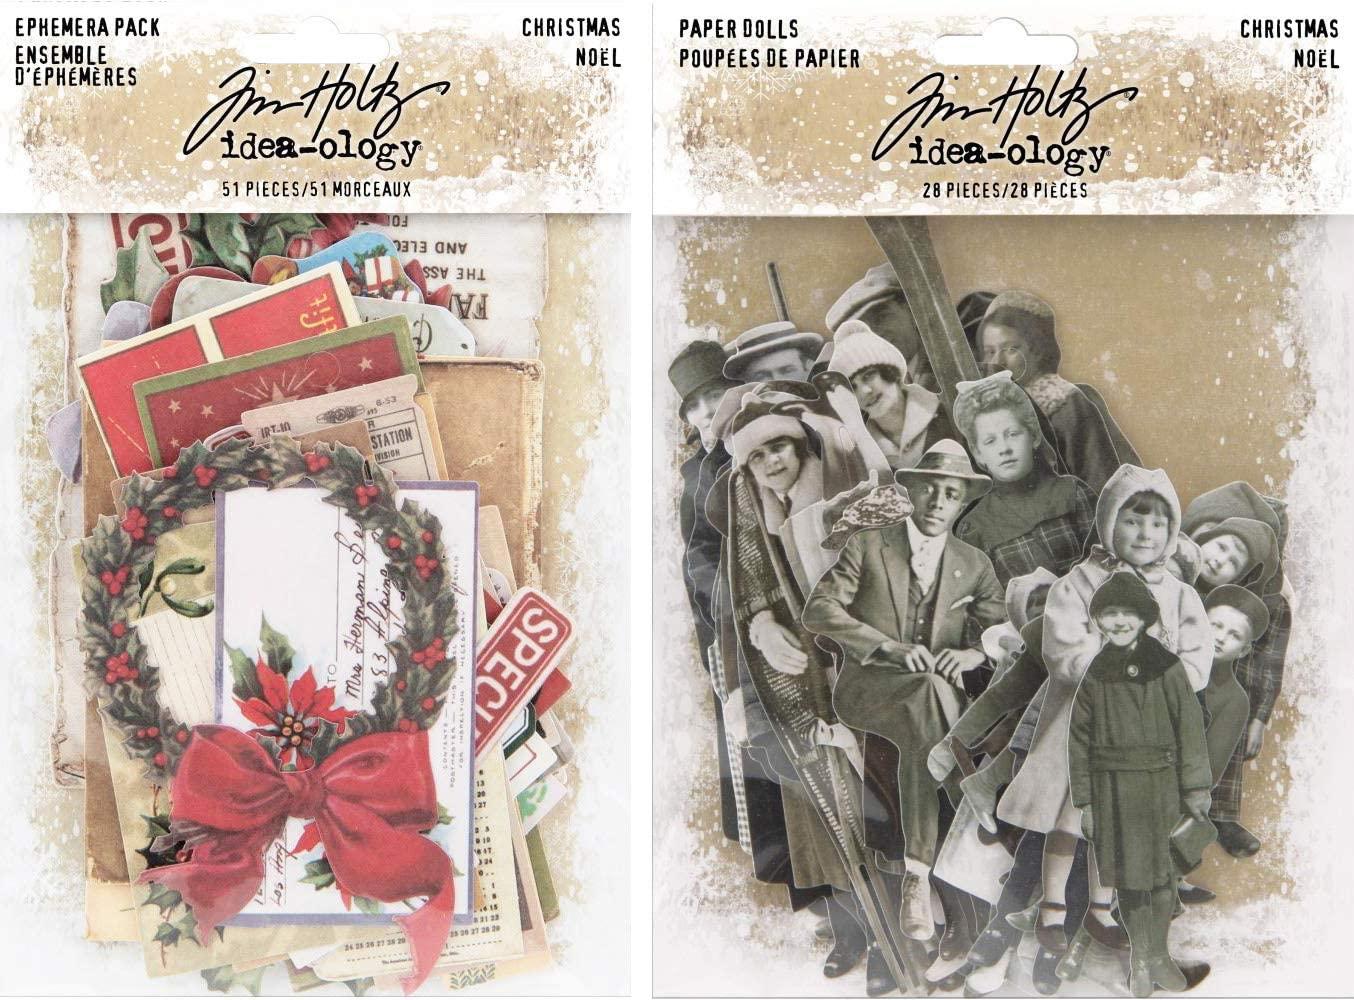 Tim Holtz Idea-Ology 2019 Christmas Ephemera and Christmas Paper Dolls - 2 Item Bundle